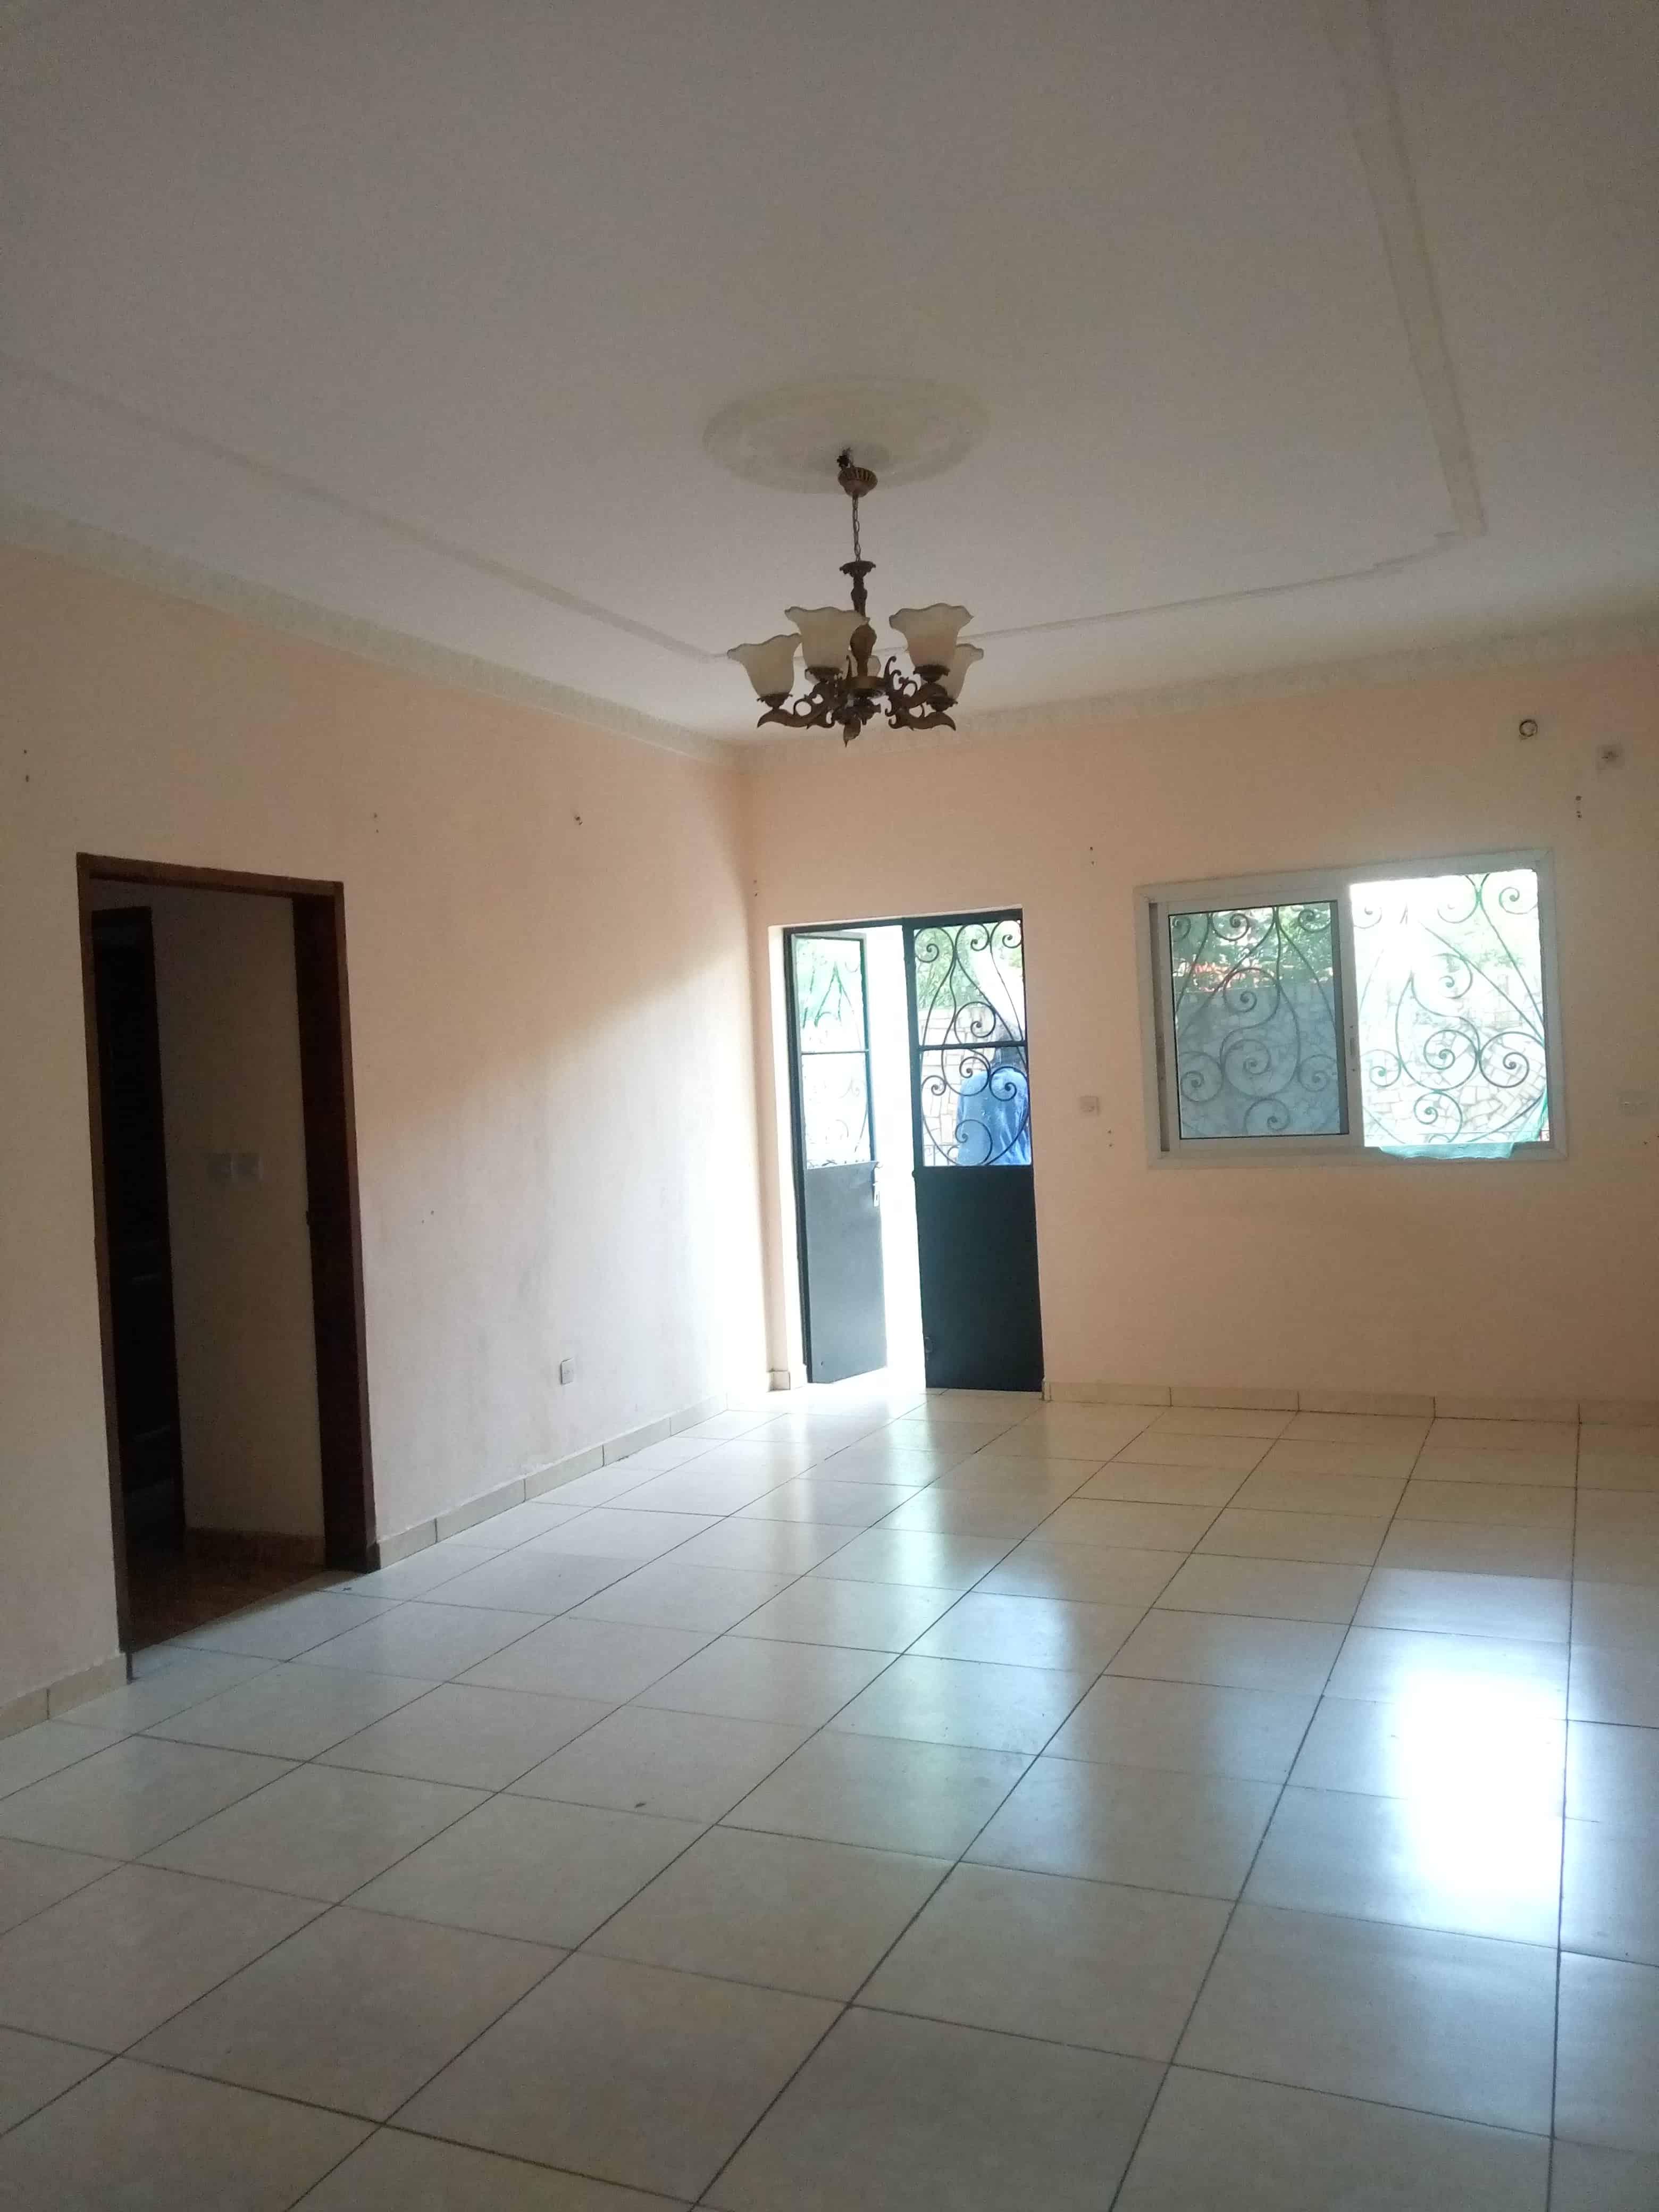 Apartment to rent - Douala, Logpom, Lycée - 1 living room(s), 2 bedroom(s), 2 bathroom(s) - 100 000 FCFA / month